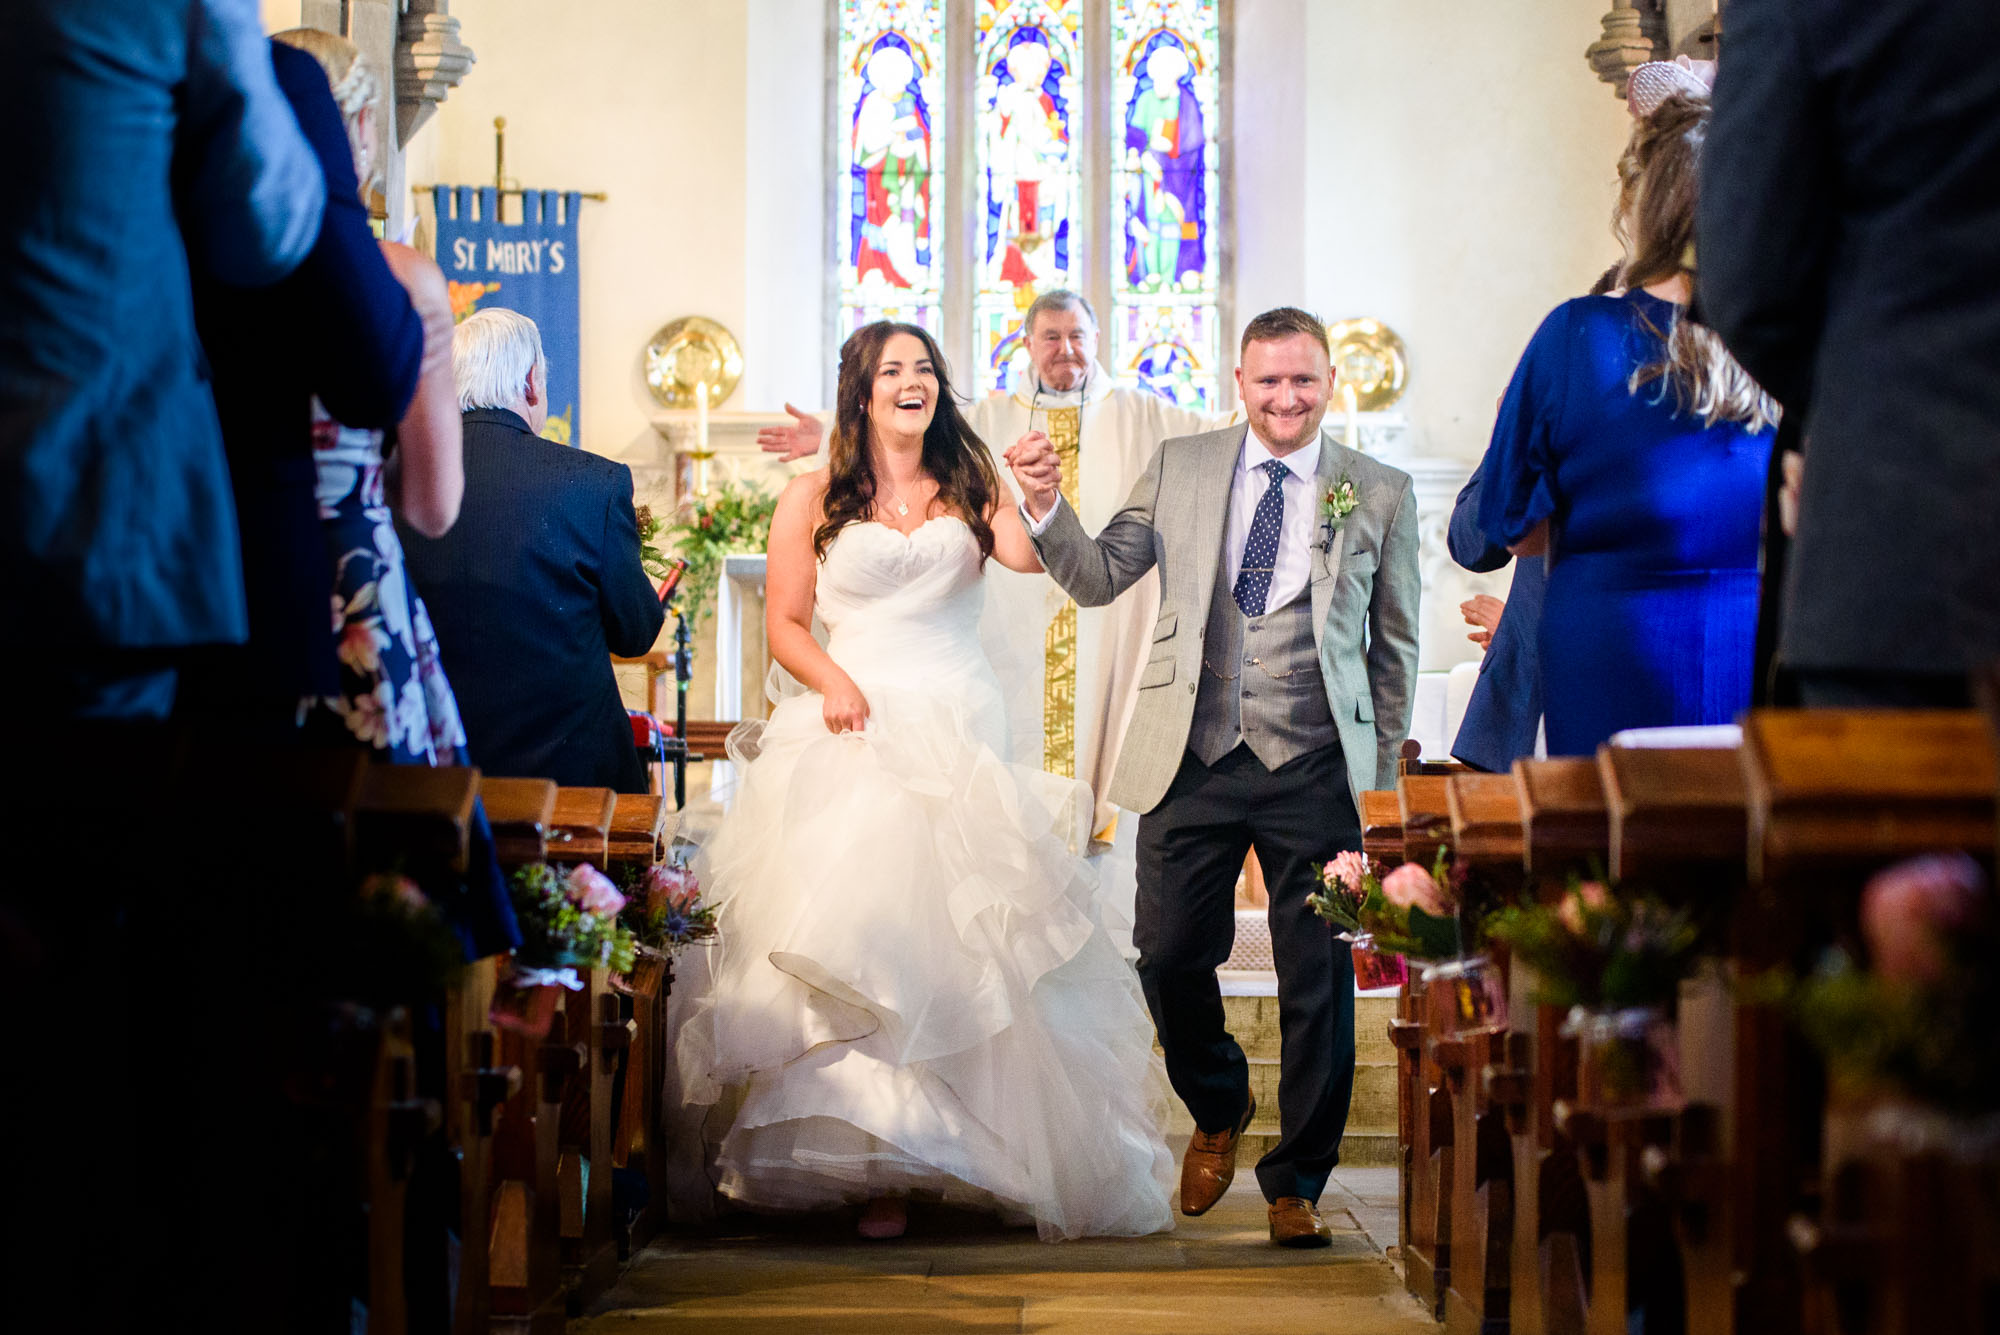 bride walking down the isle at st mary's church in Llanfairpwllgwyngyll